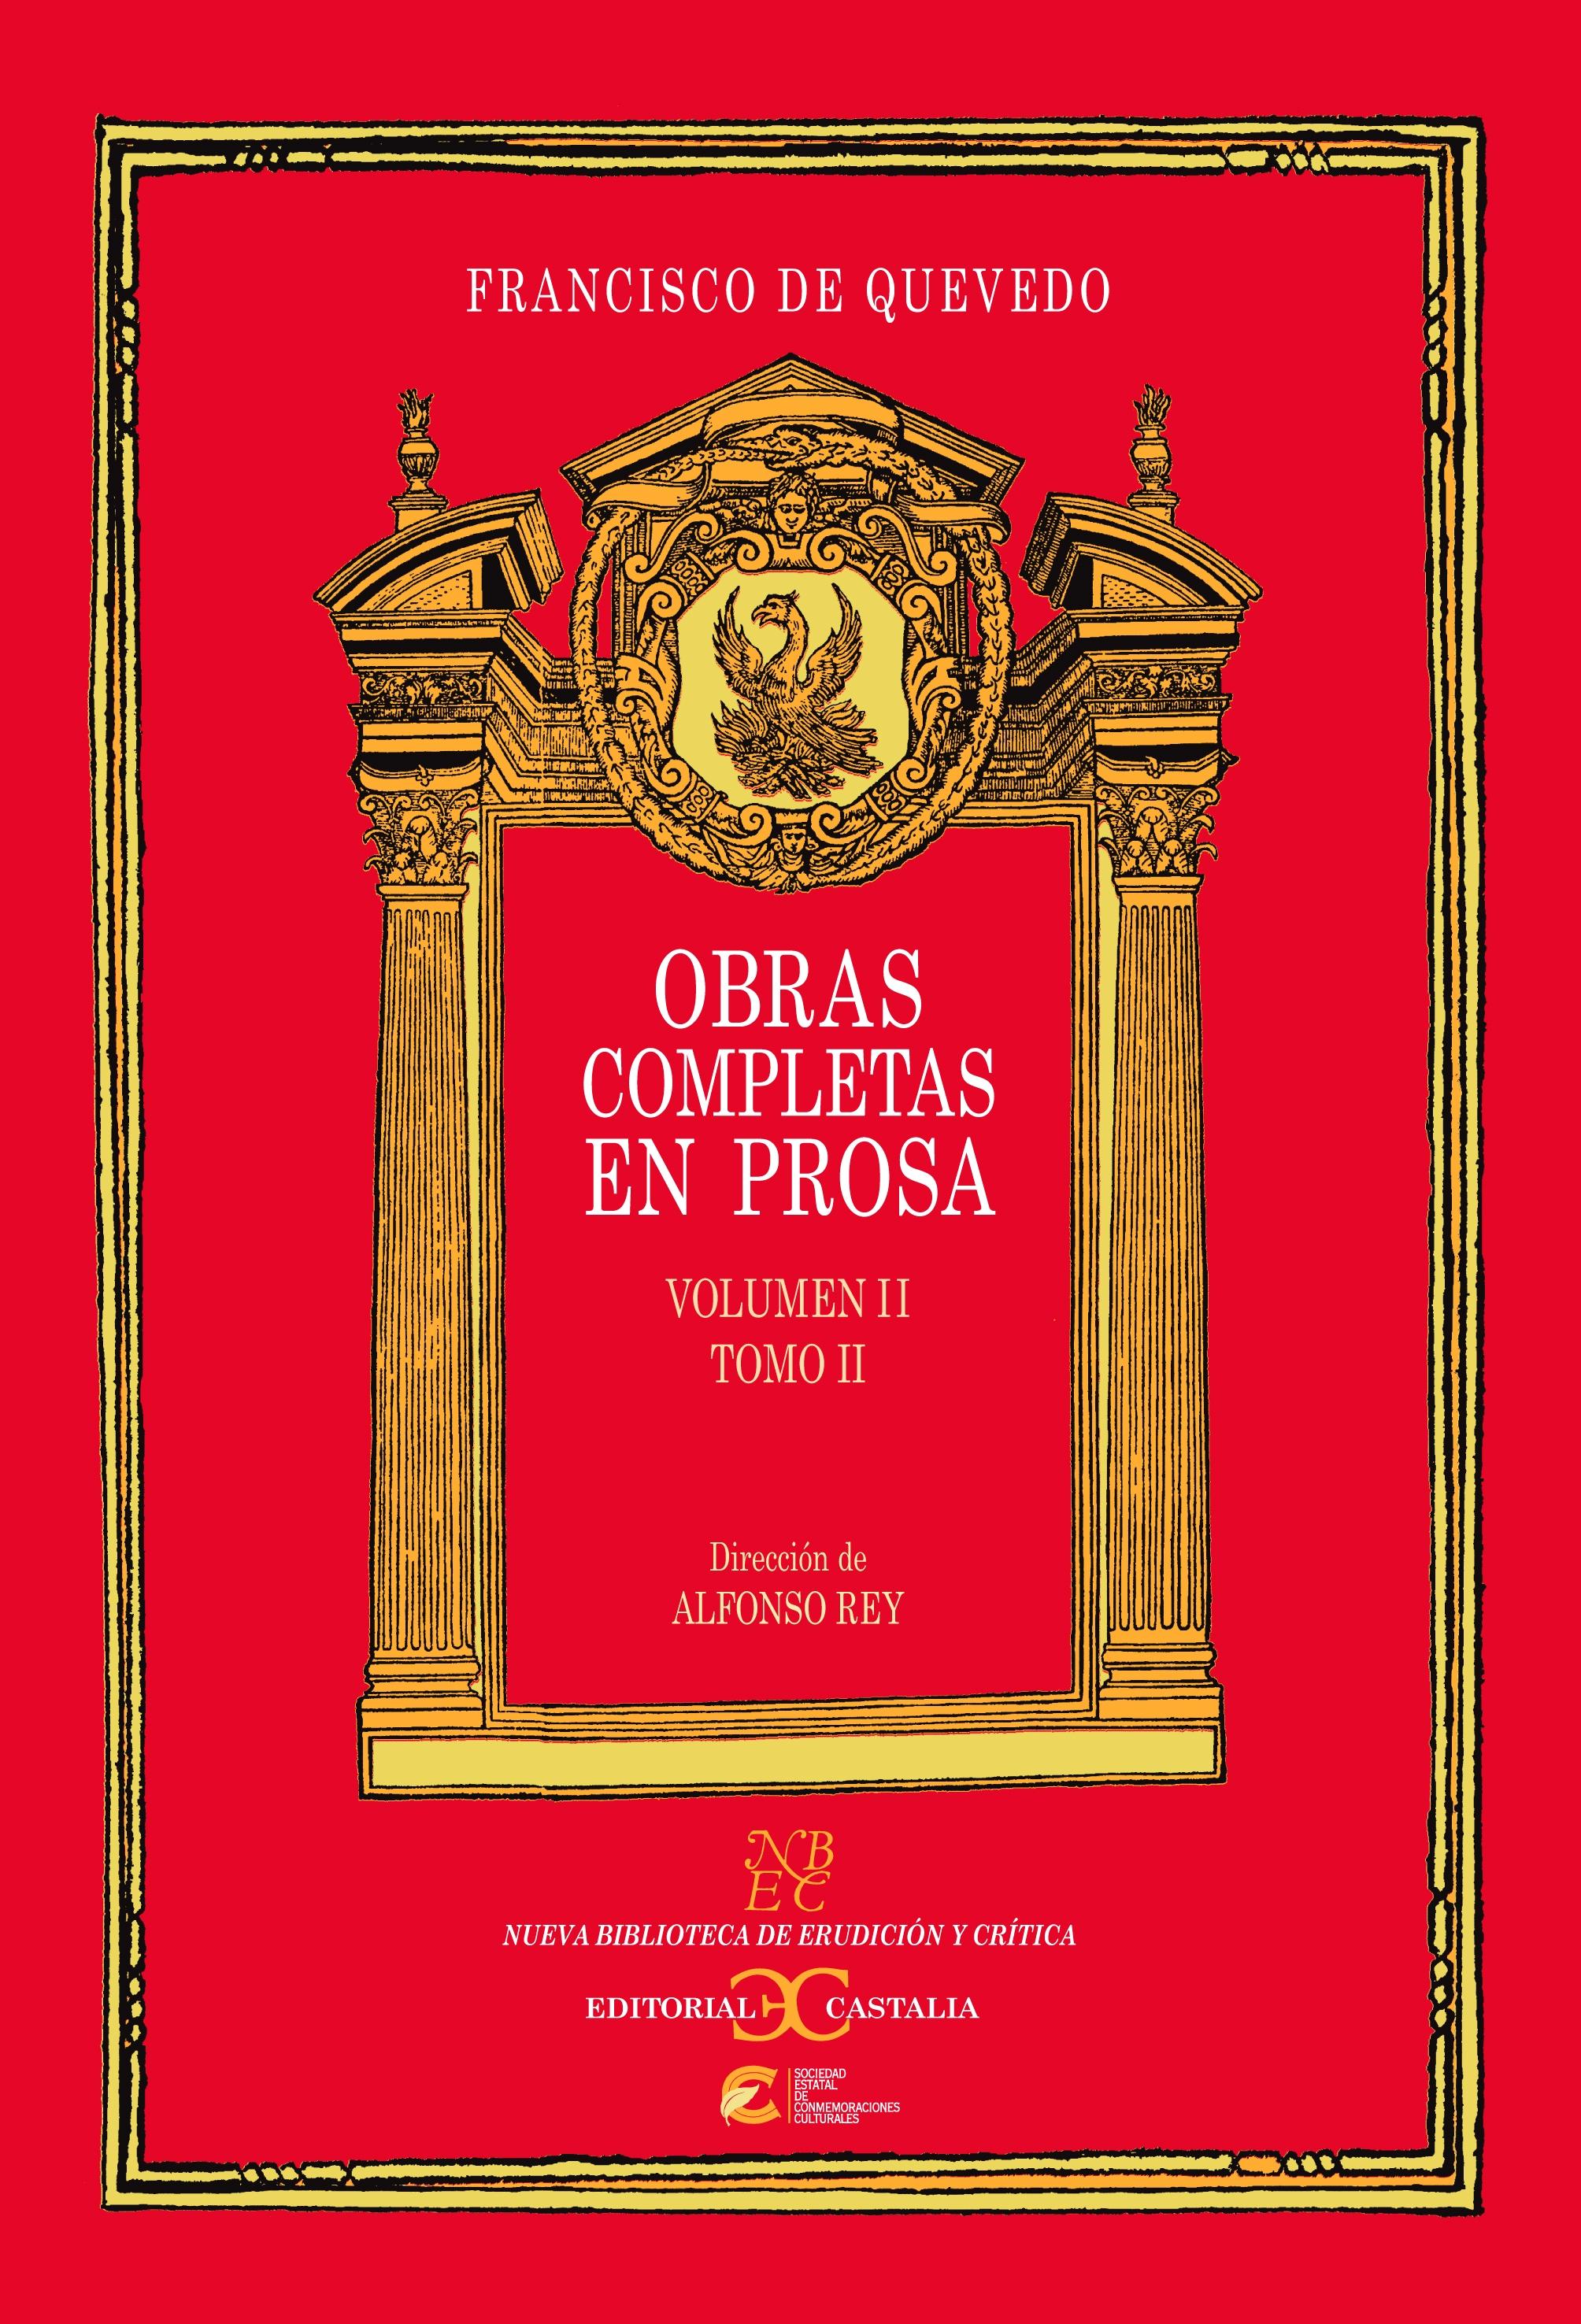 Obras completas en Prosa. Volumen II, Tomo II